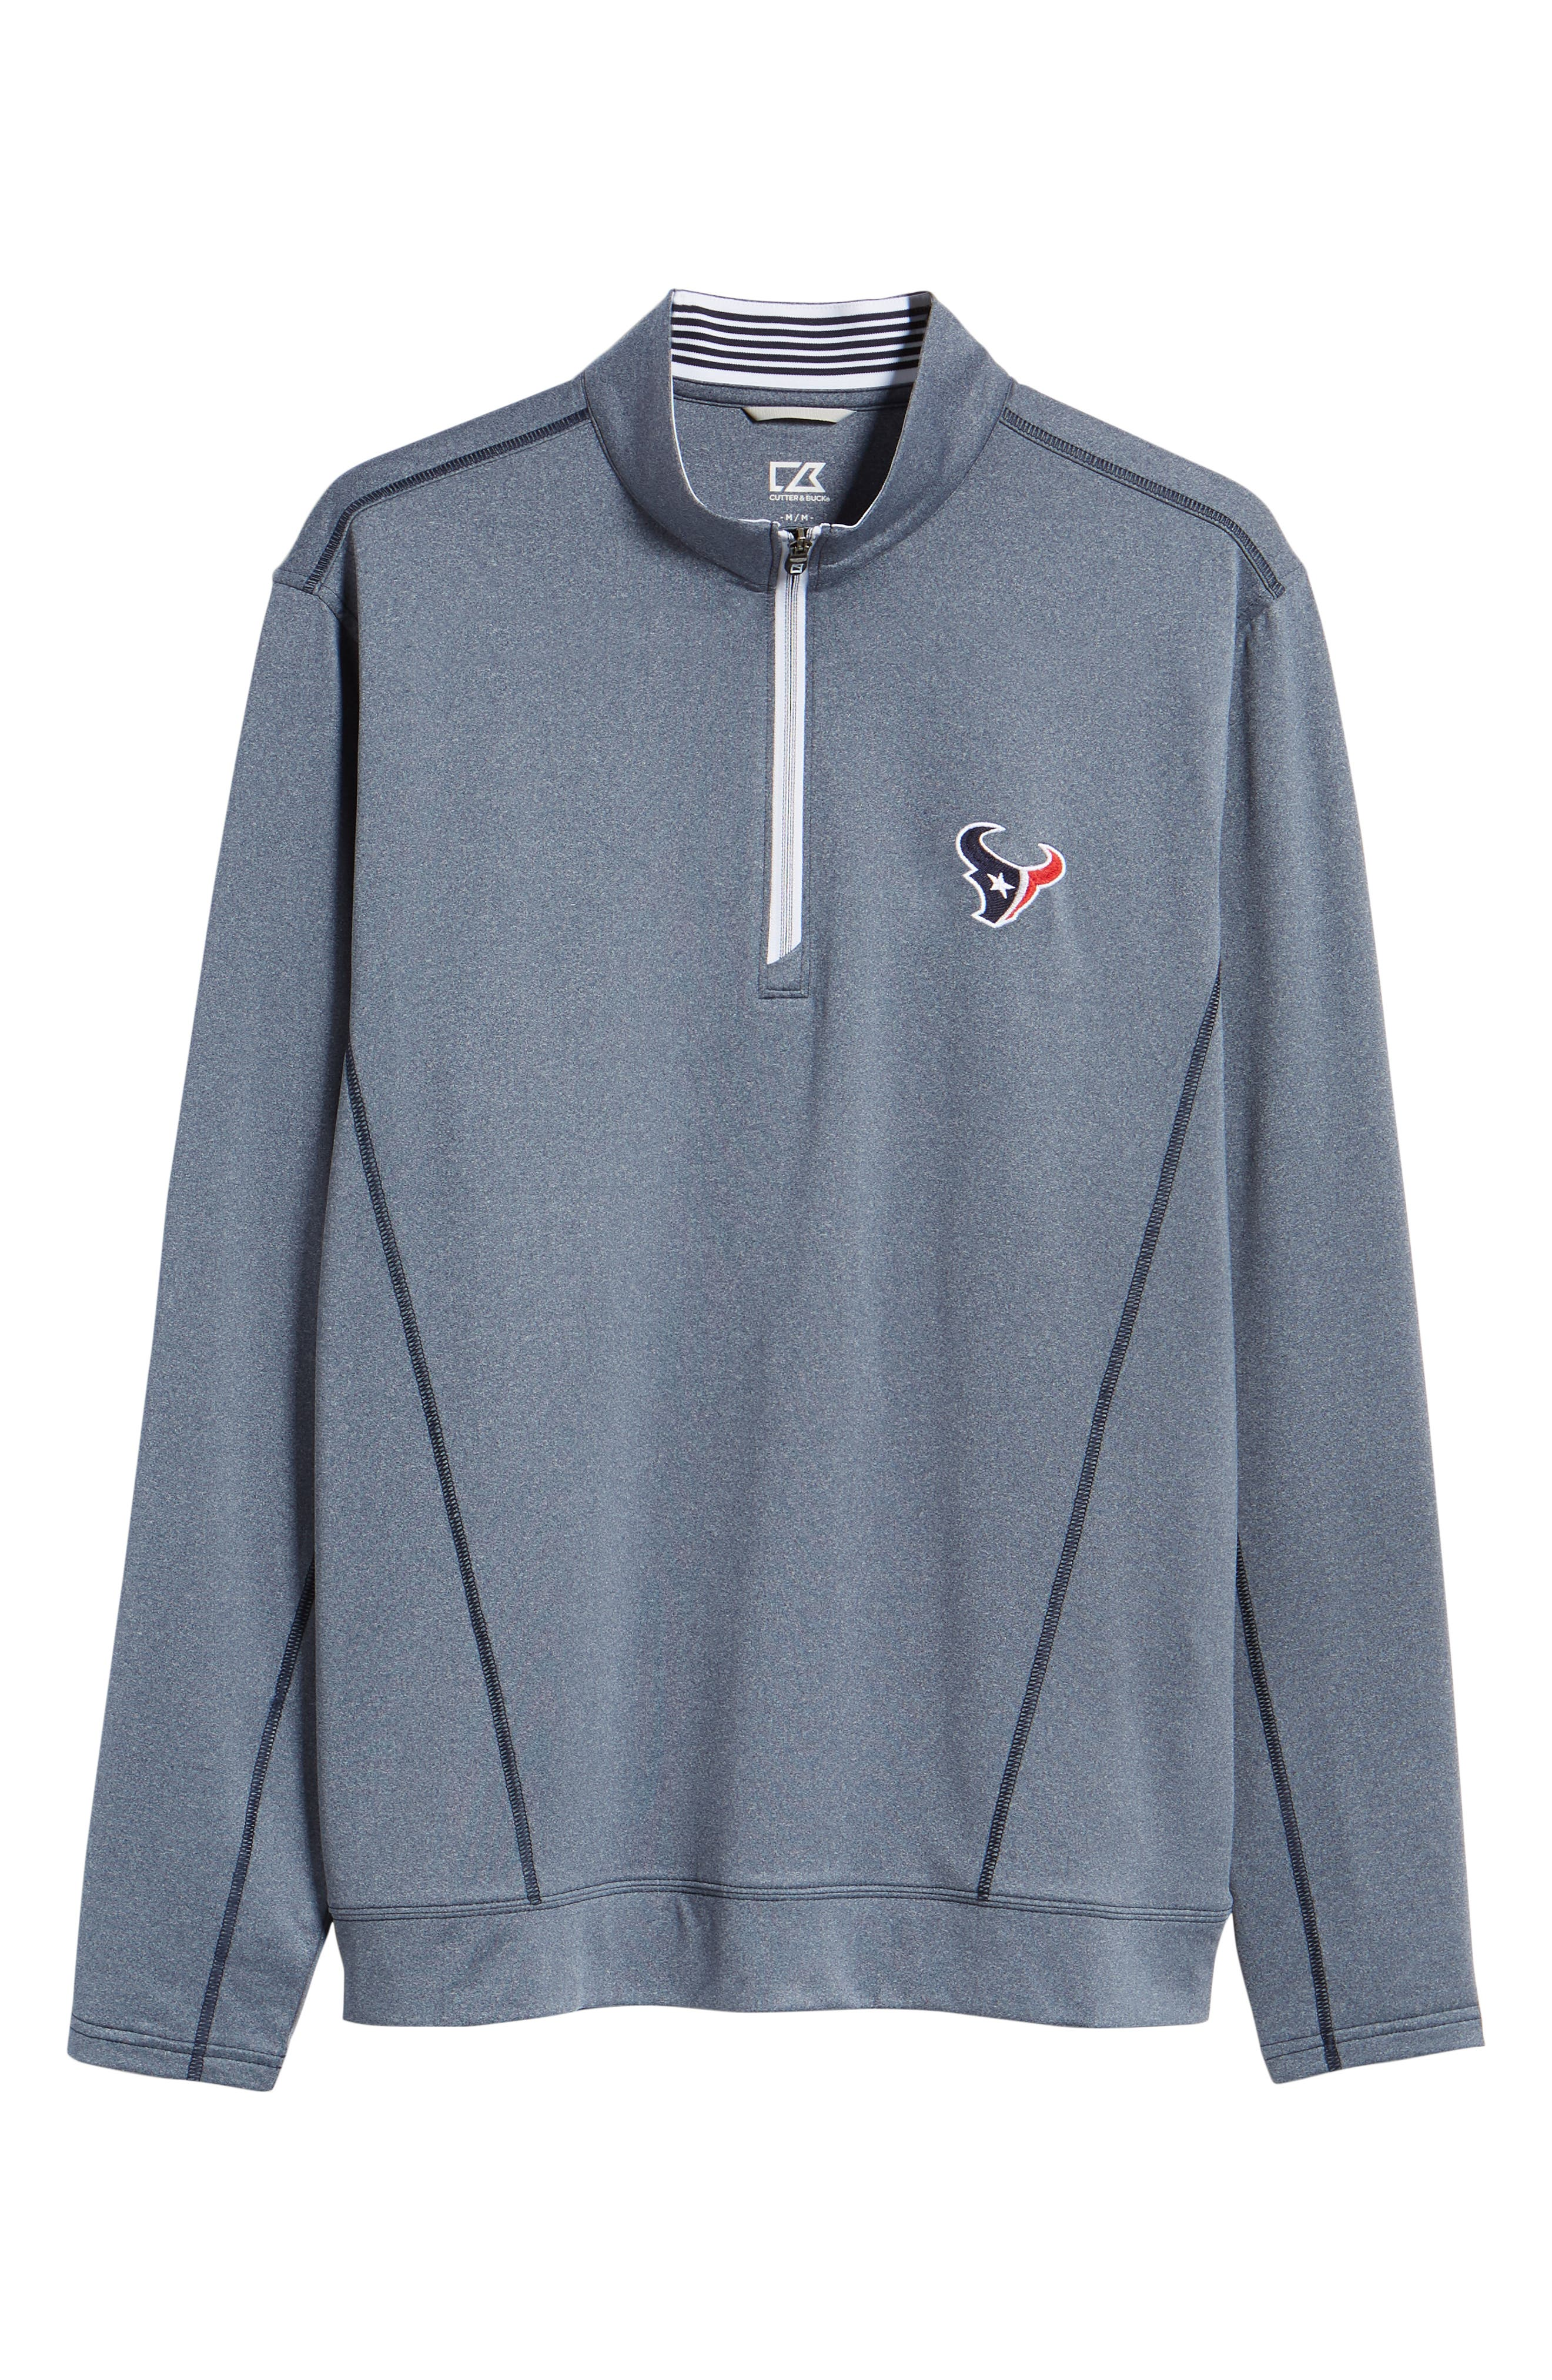 Endurance Houston Texans Regular Fit Pullover,                             Alternate thumbnail 6, color,                             LIBERTY NAVY HEATHER